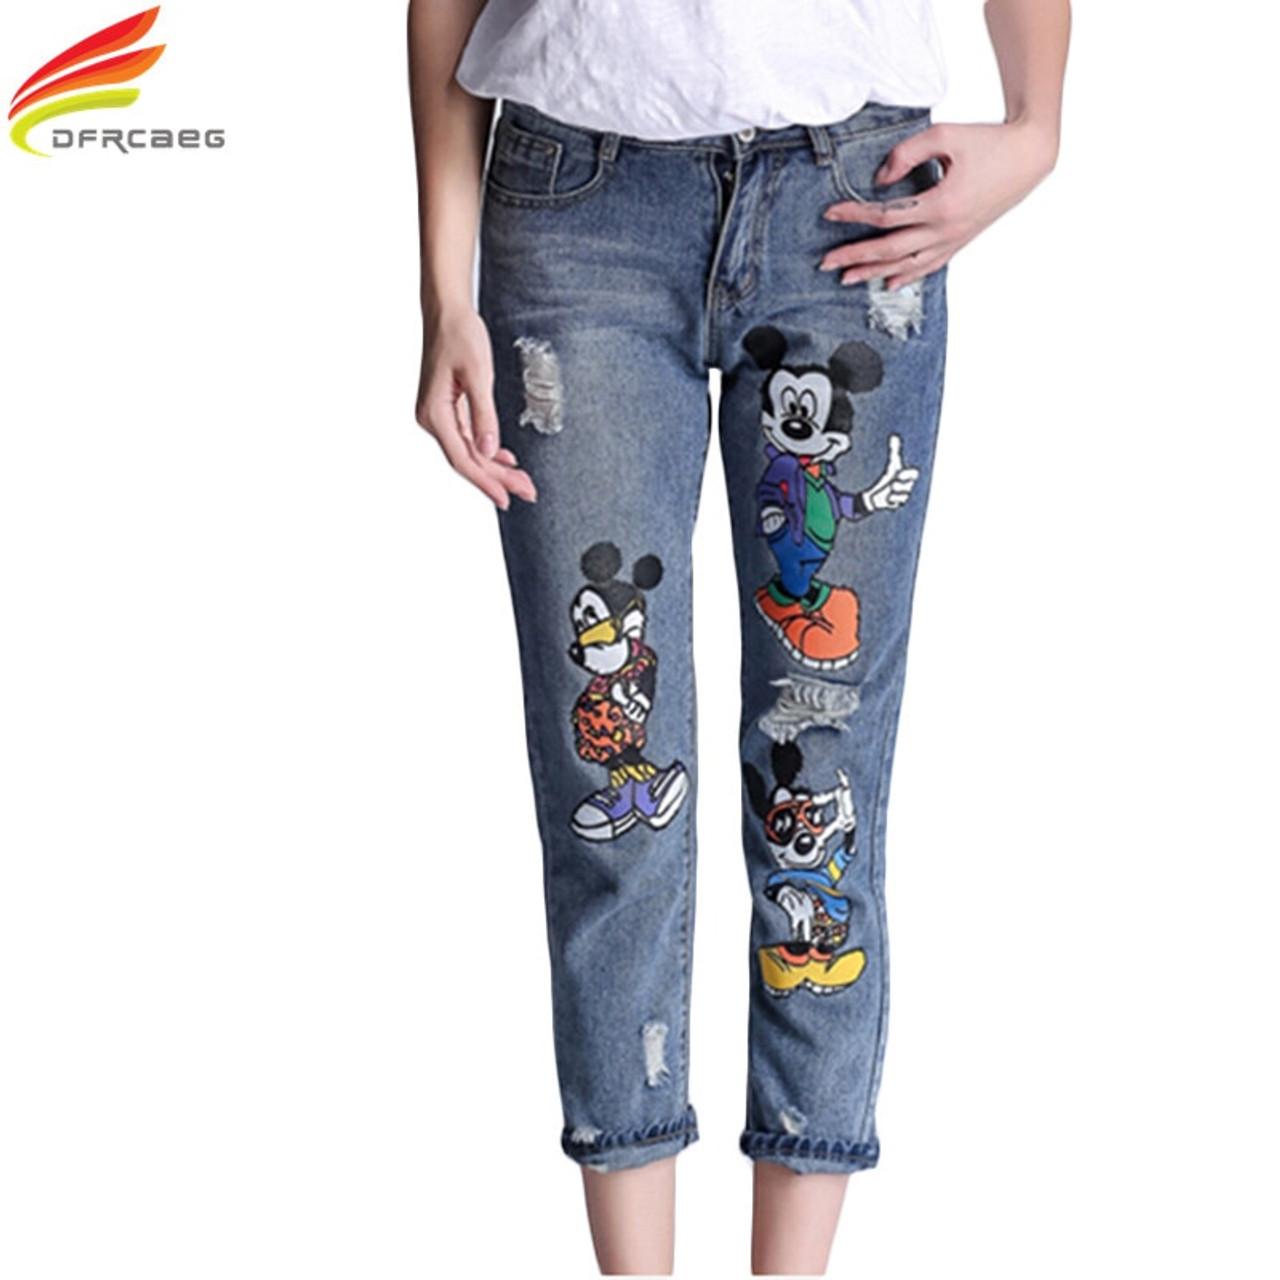 2cdbc8d3cb 5XL 2018 Fashion High Waist Pencil Boyfriend Jeans Femme Print Cartoon Jeans  Woman Denim Pants Plus ...